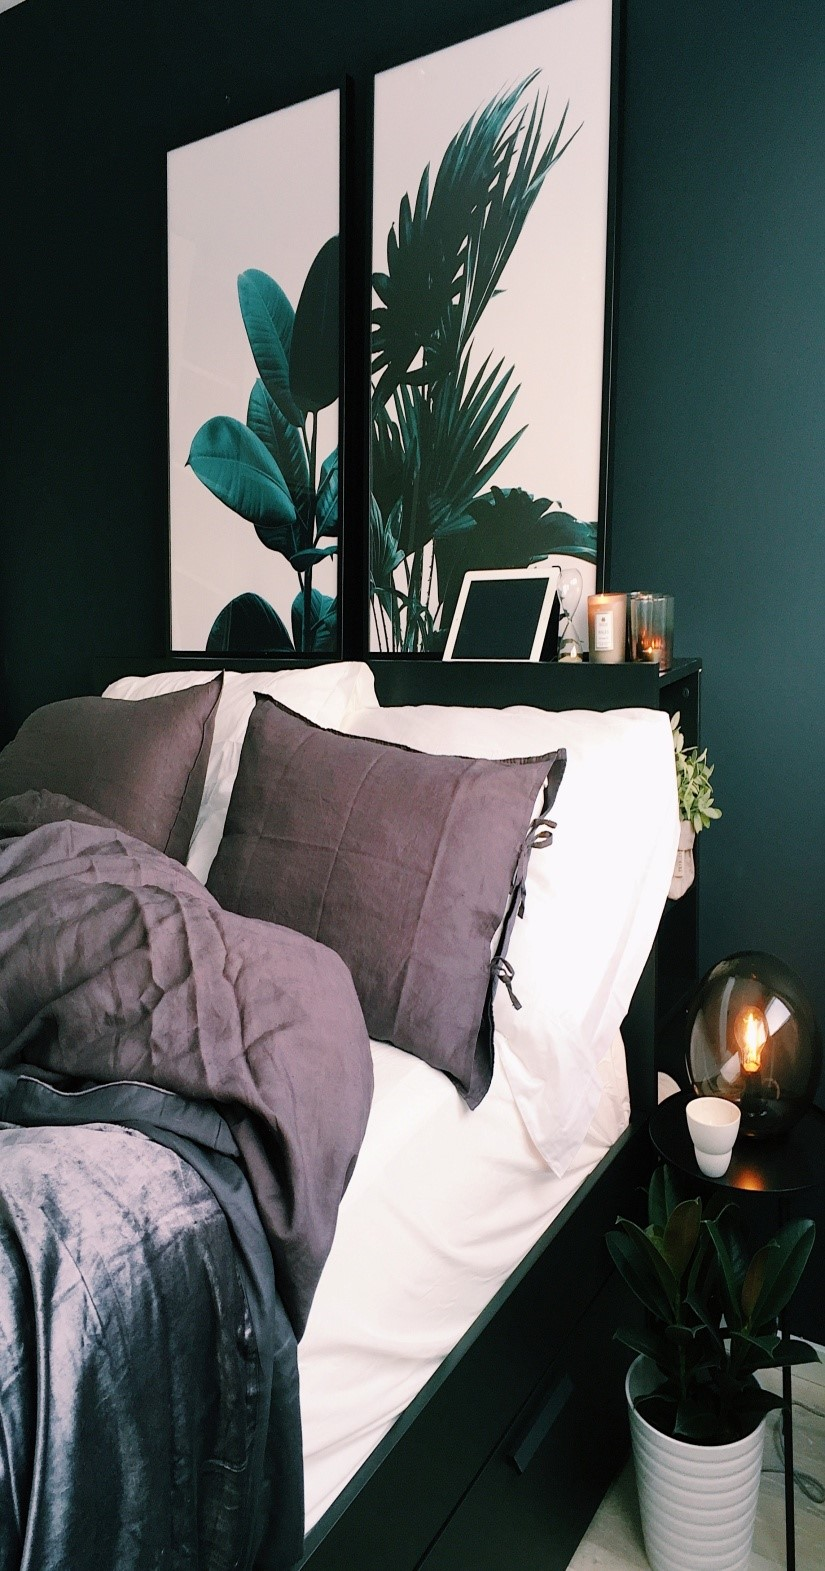 Spruce up your farmhouse bedroom with farmhouse pillows